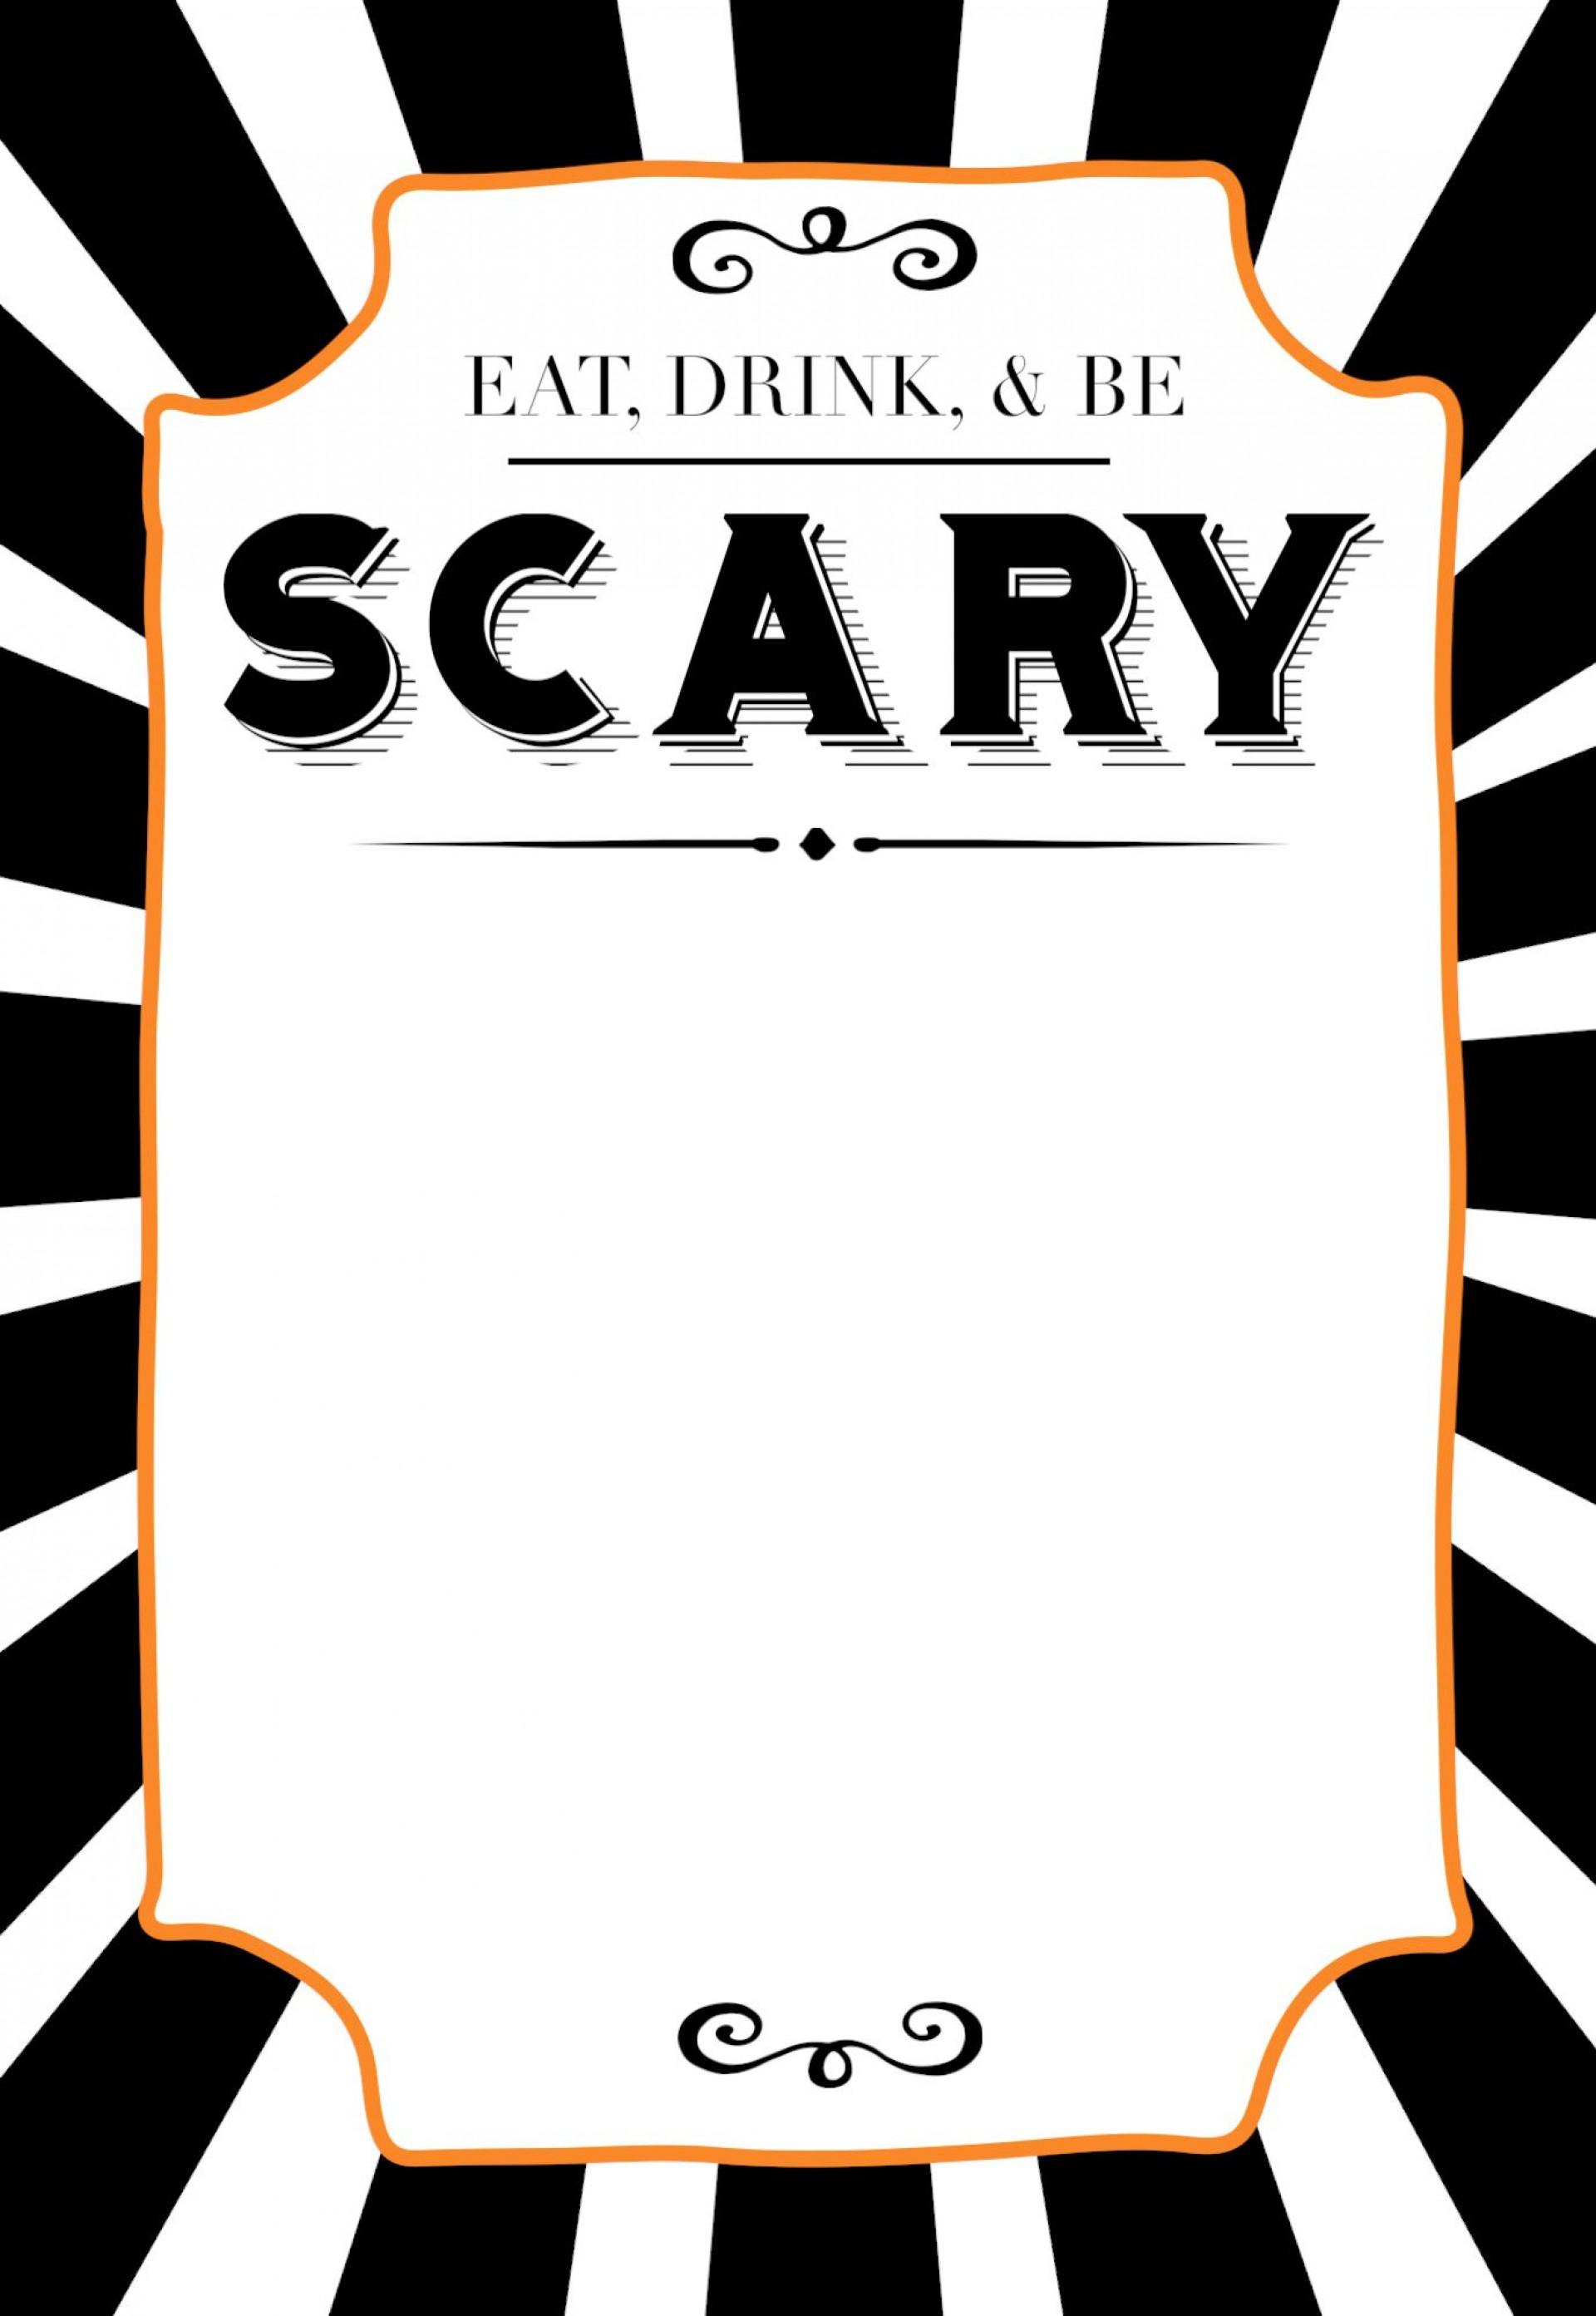 015 Fantastic Free Halloween Invitation Template Highest Quality  Templates Microsoft Word Wedding Printable Party1920